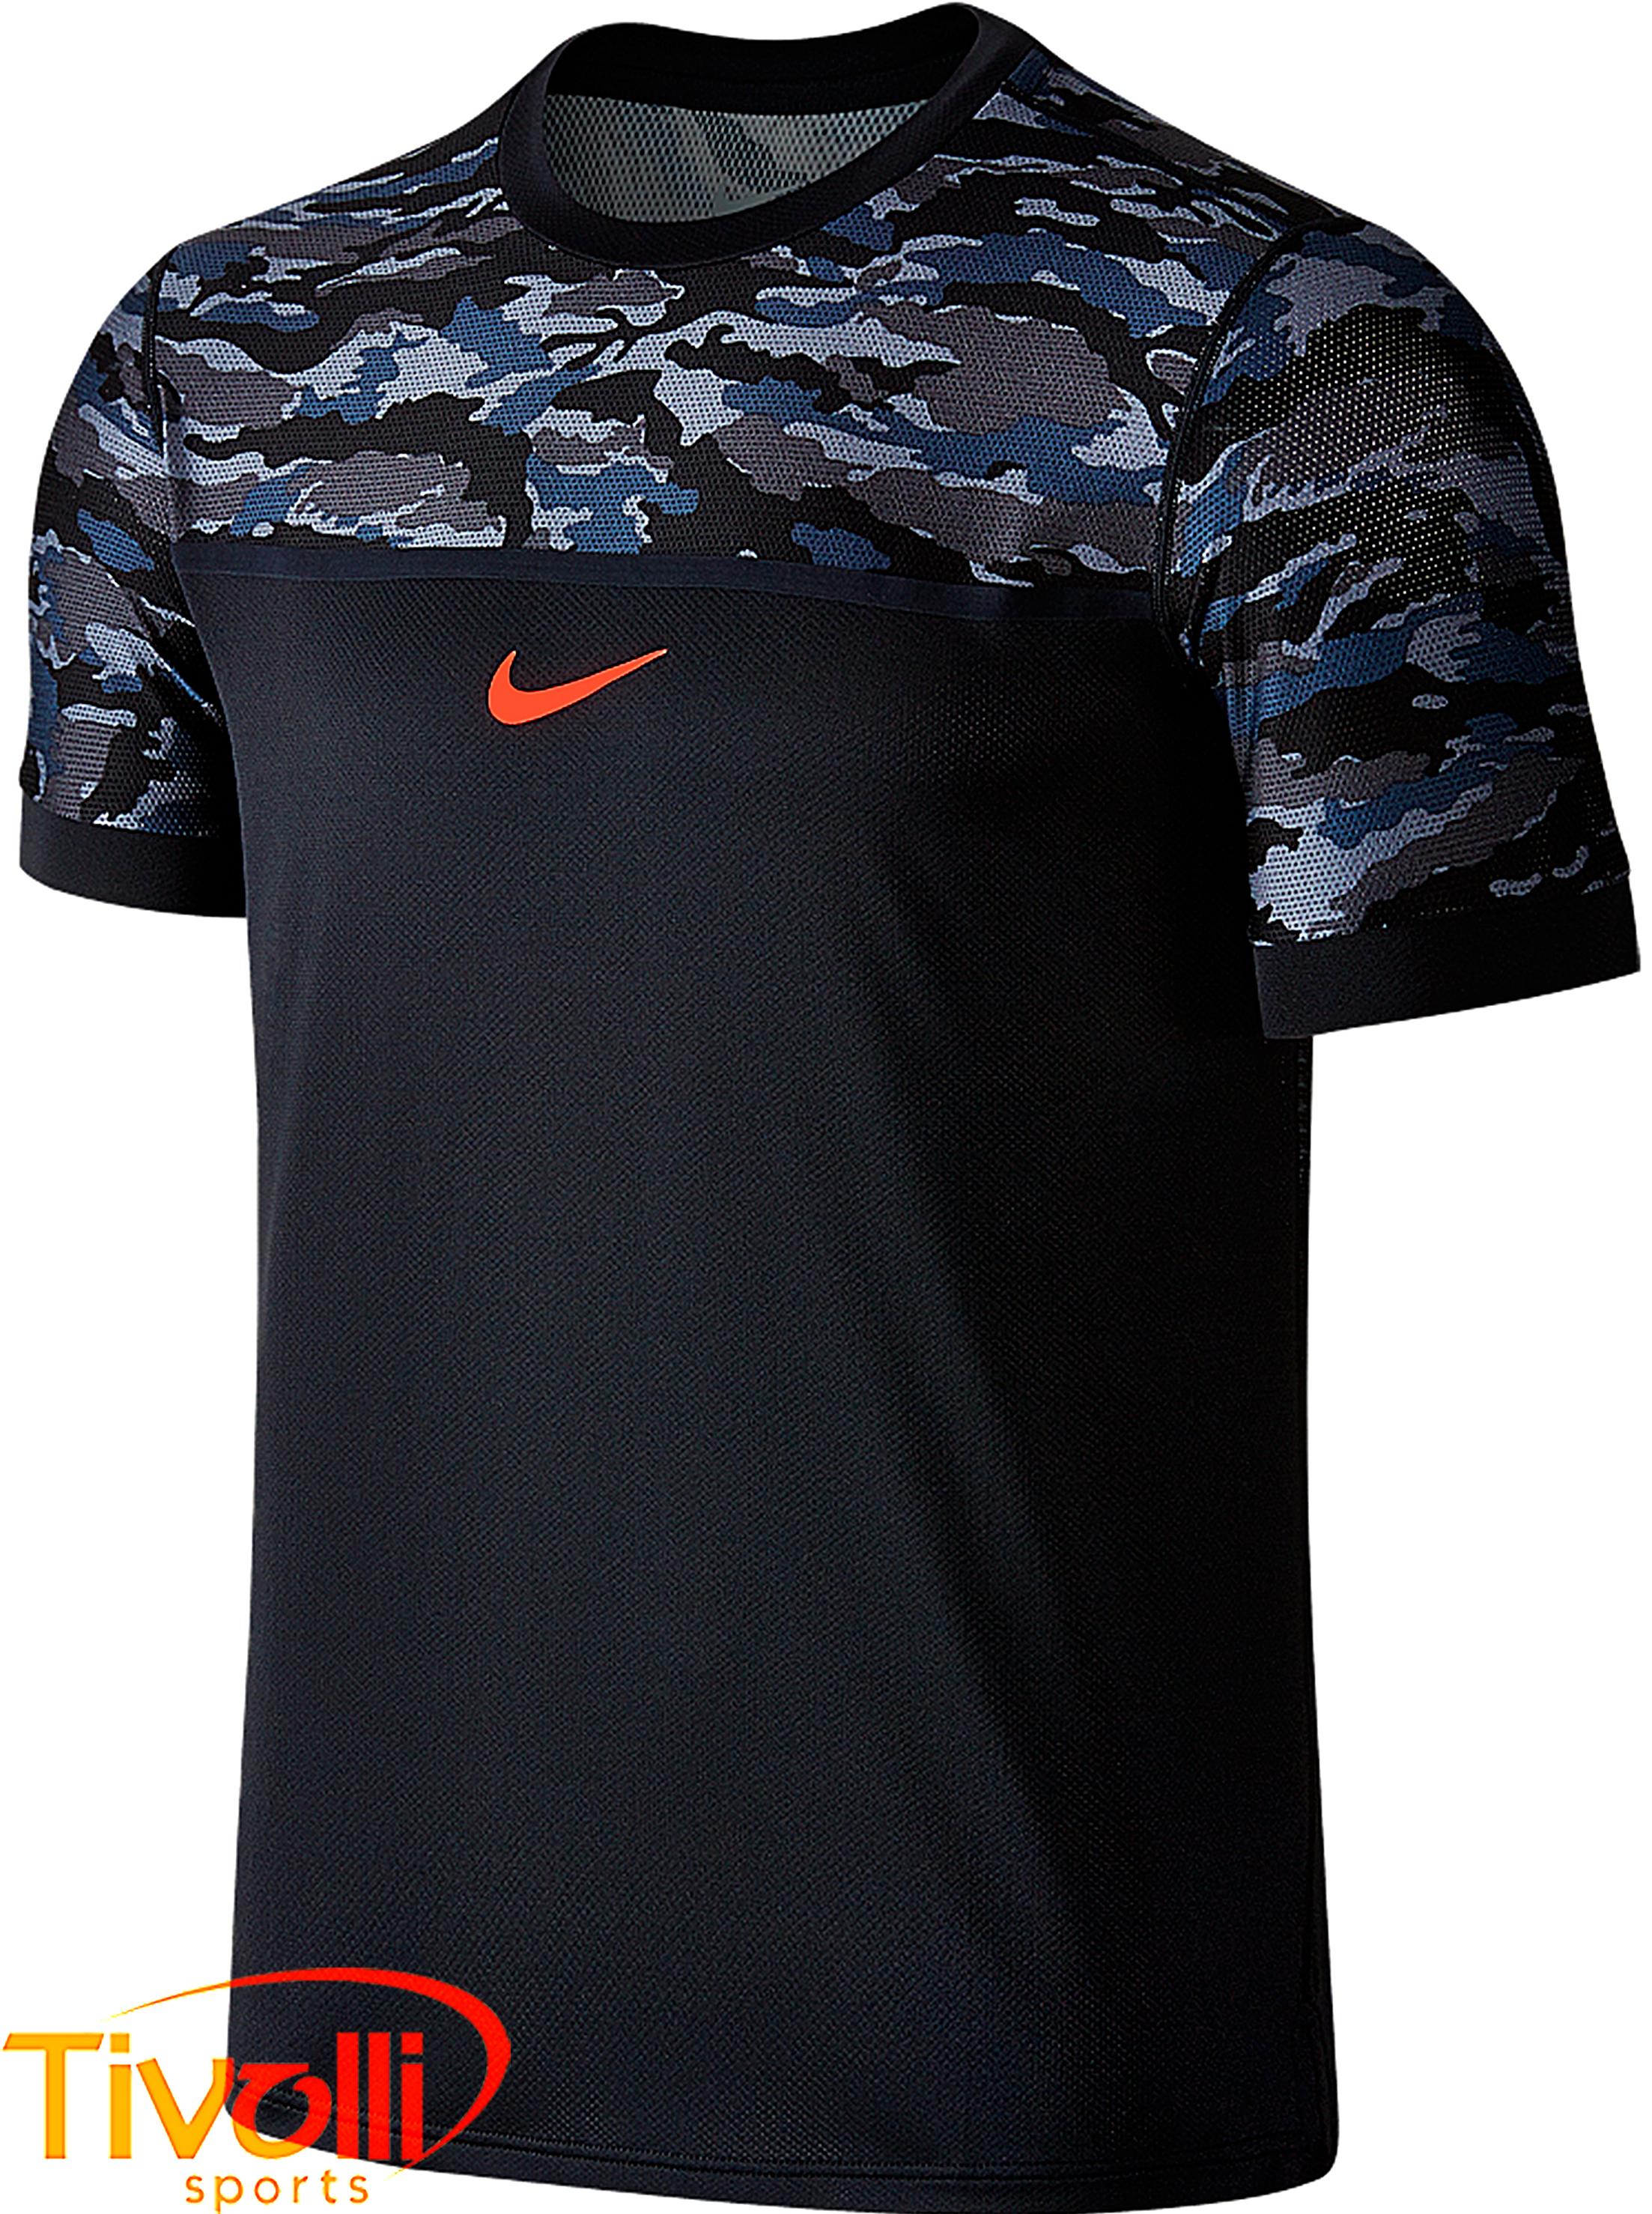 88e85f9d05 Camiseta Nike Challenger Premier Rafa Crew Preto Camuflada - US Open 2015 (Rafael  Nadal)